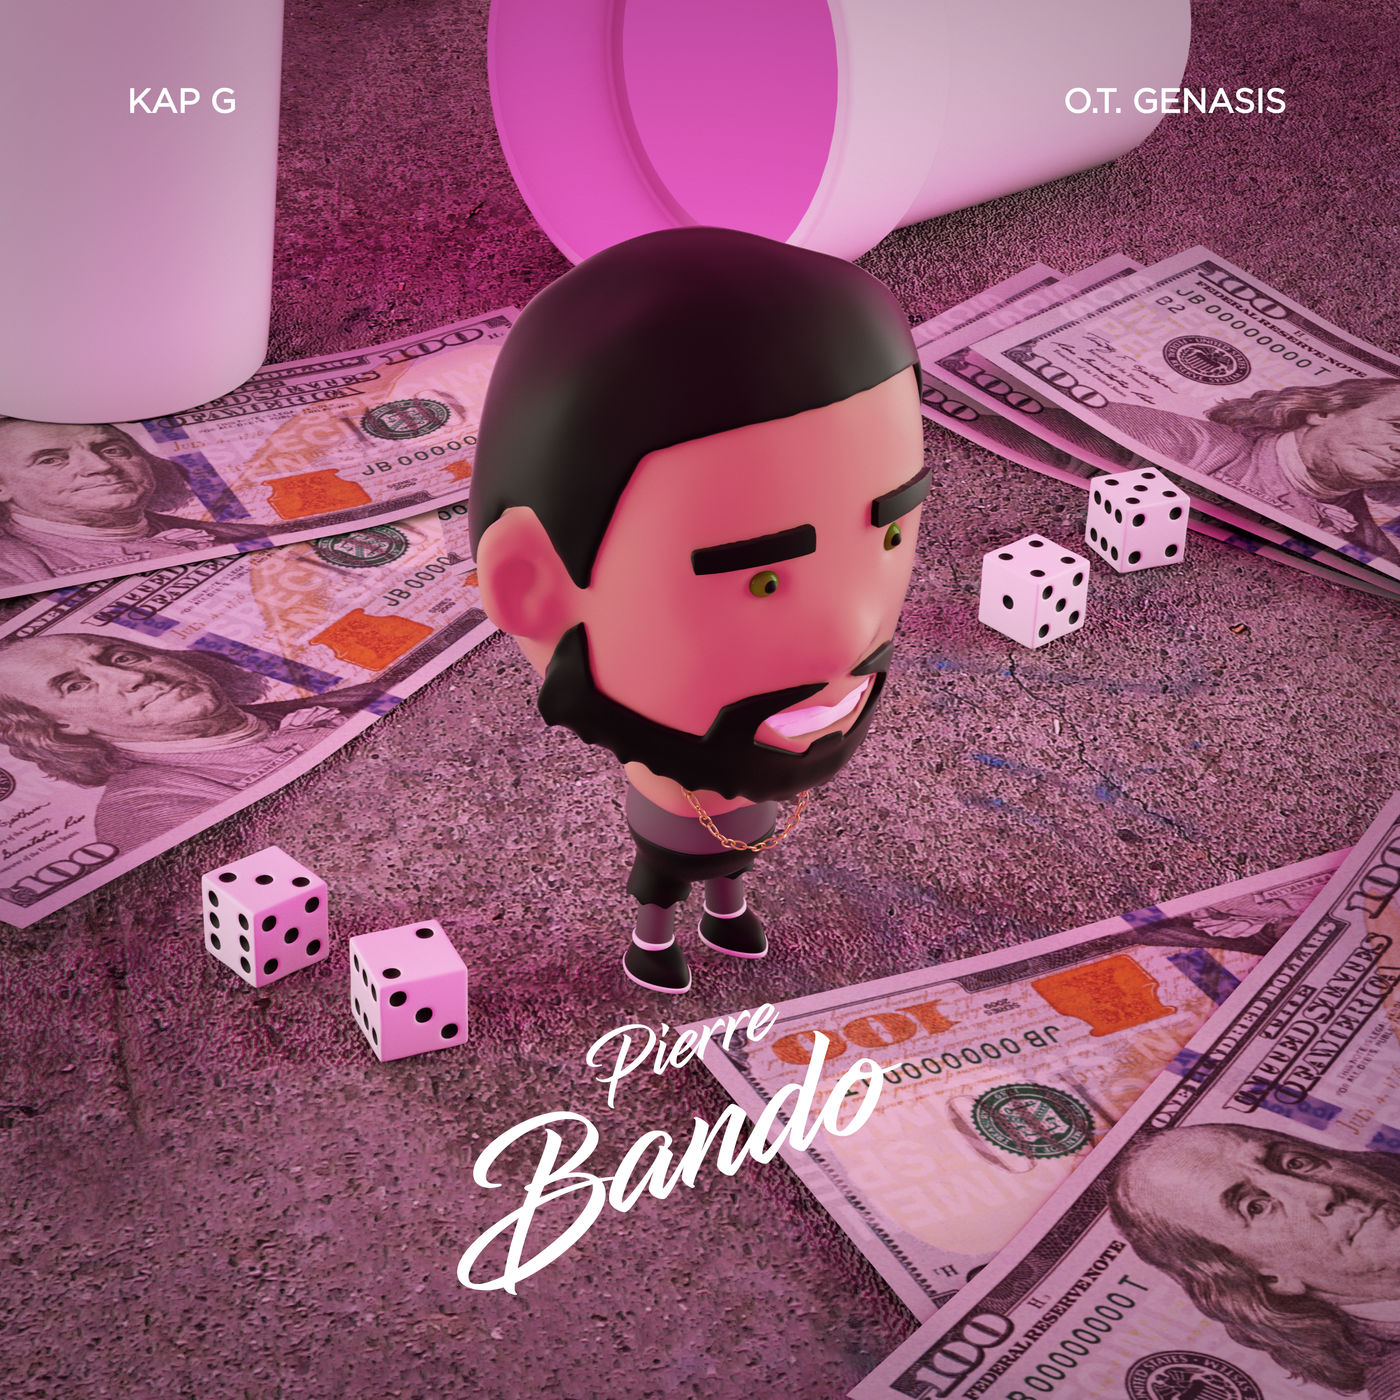 Pierre - Bando (feat. Kap G & O.T. Genasis) - Single   Cover